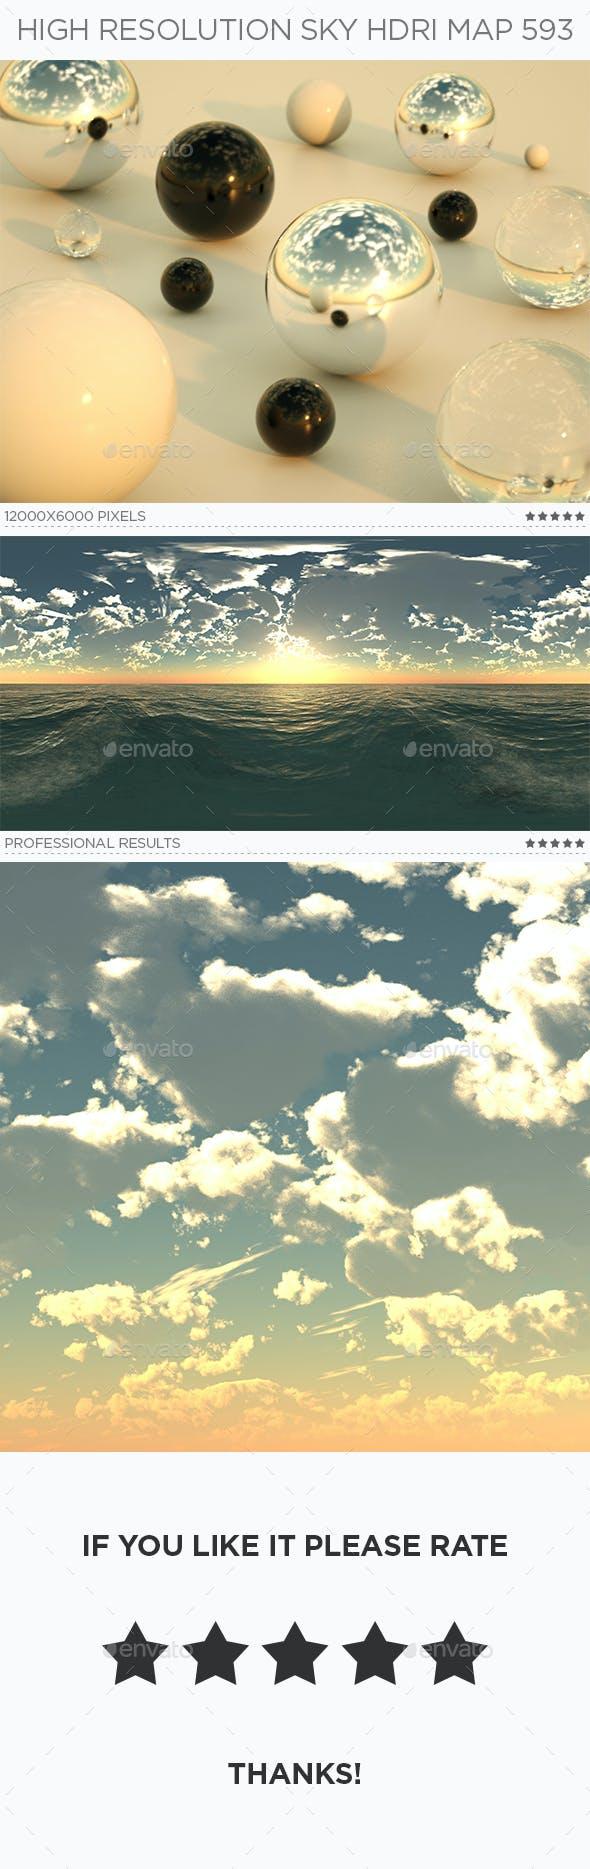 High Resolution Sky HDRi Map 593 - 3DOcean Item for Sale